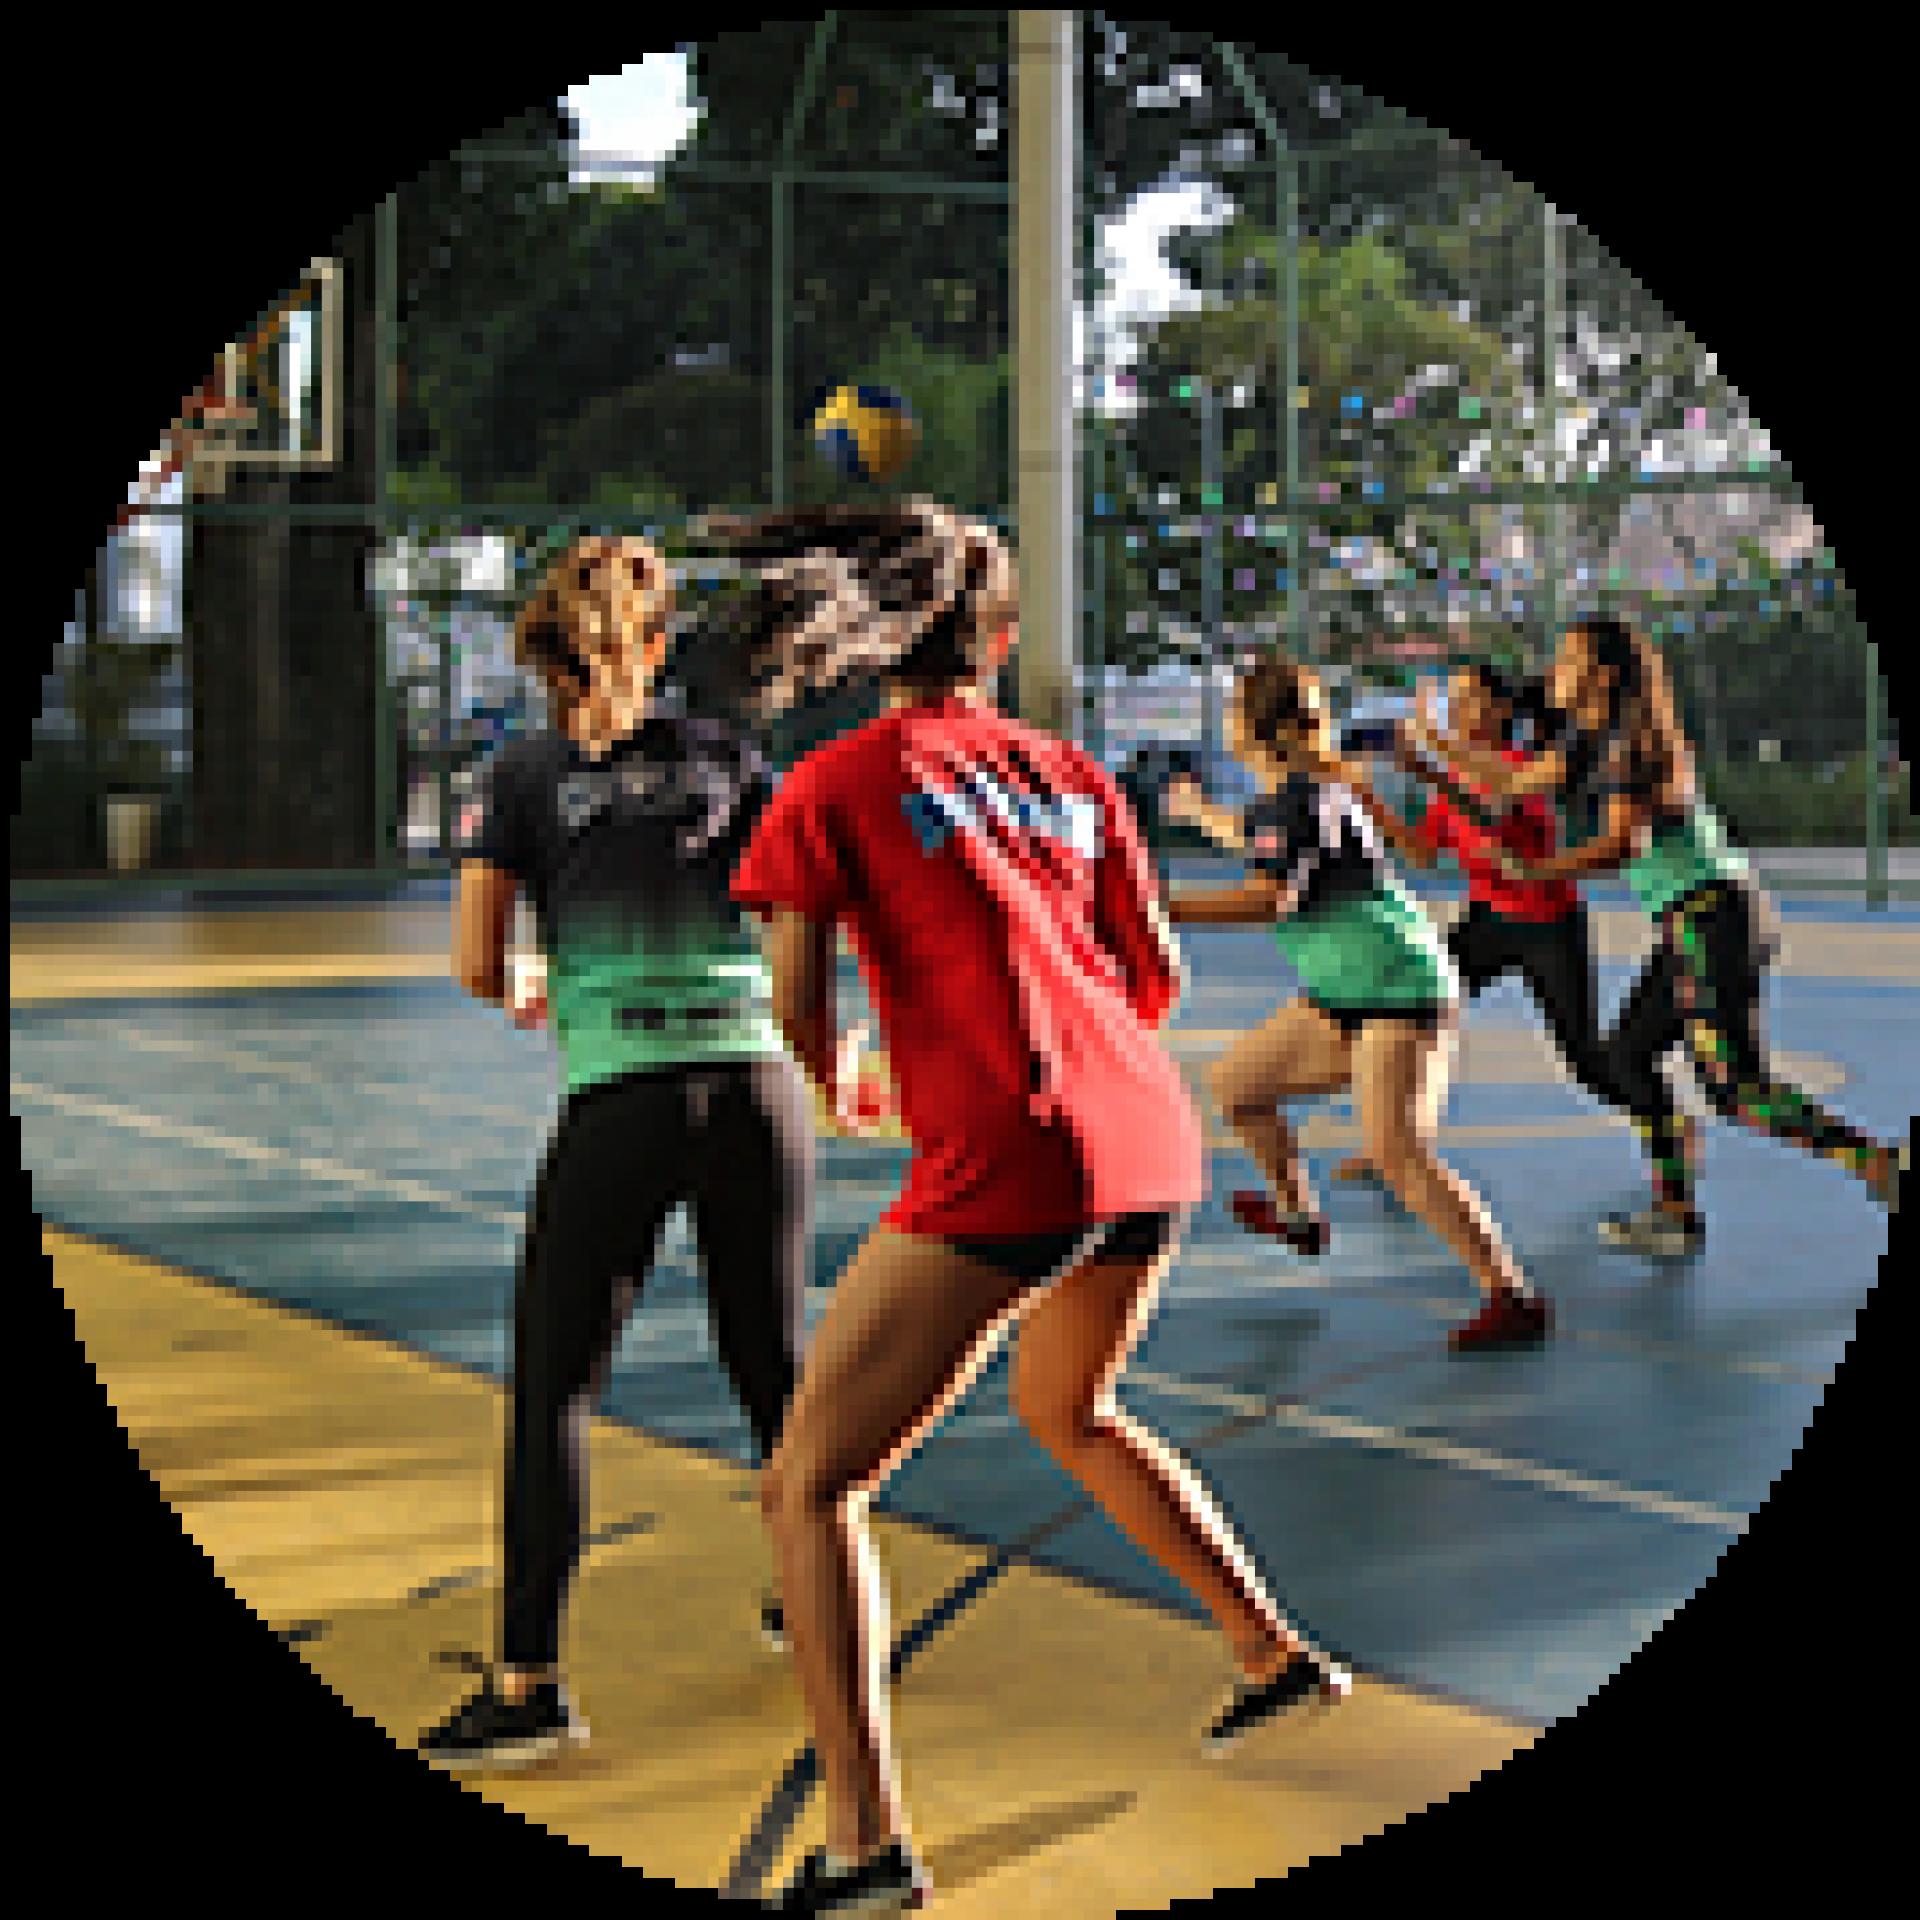 Voleibol, Handebol, Futsal e Basquetebol